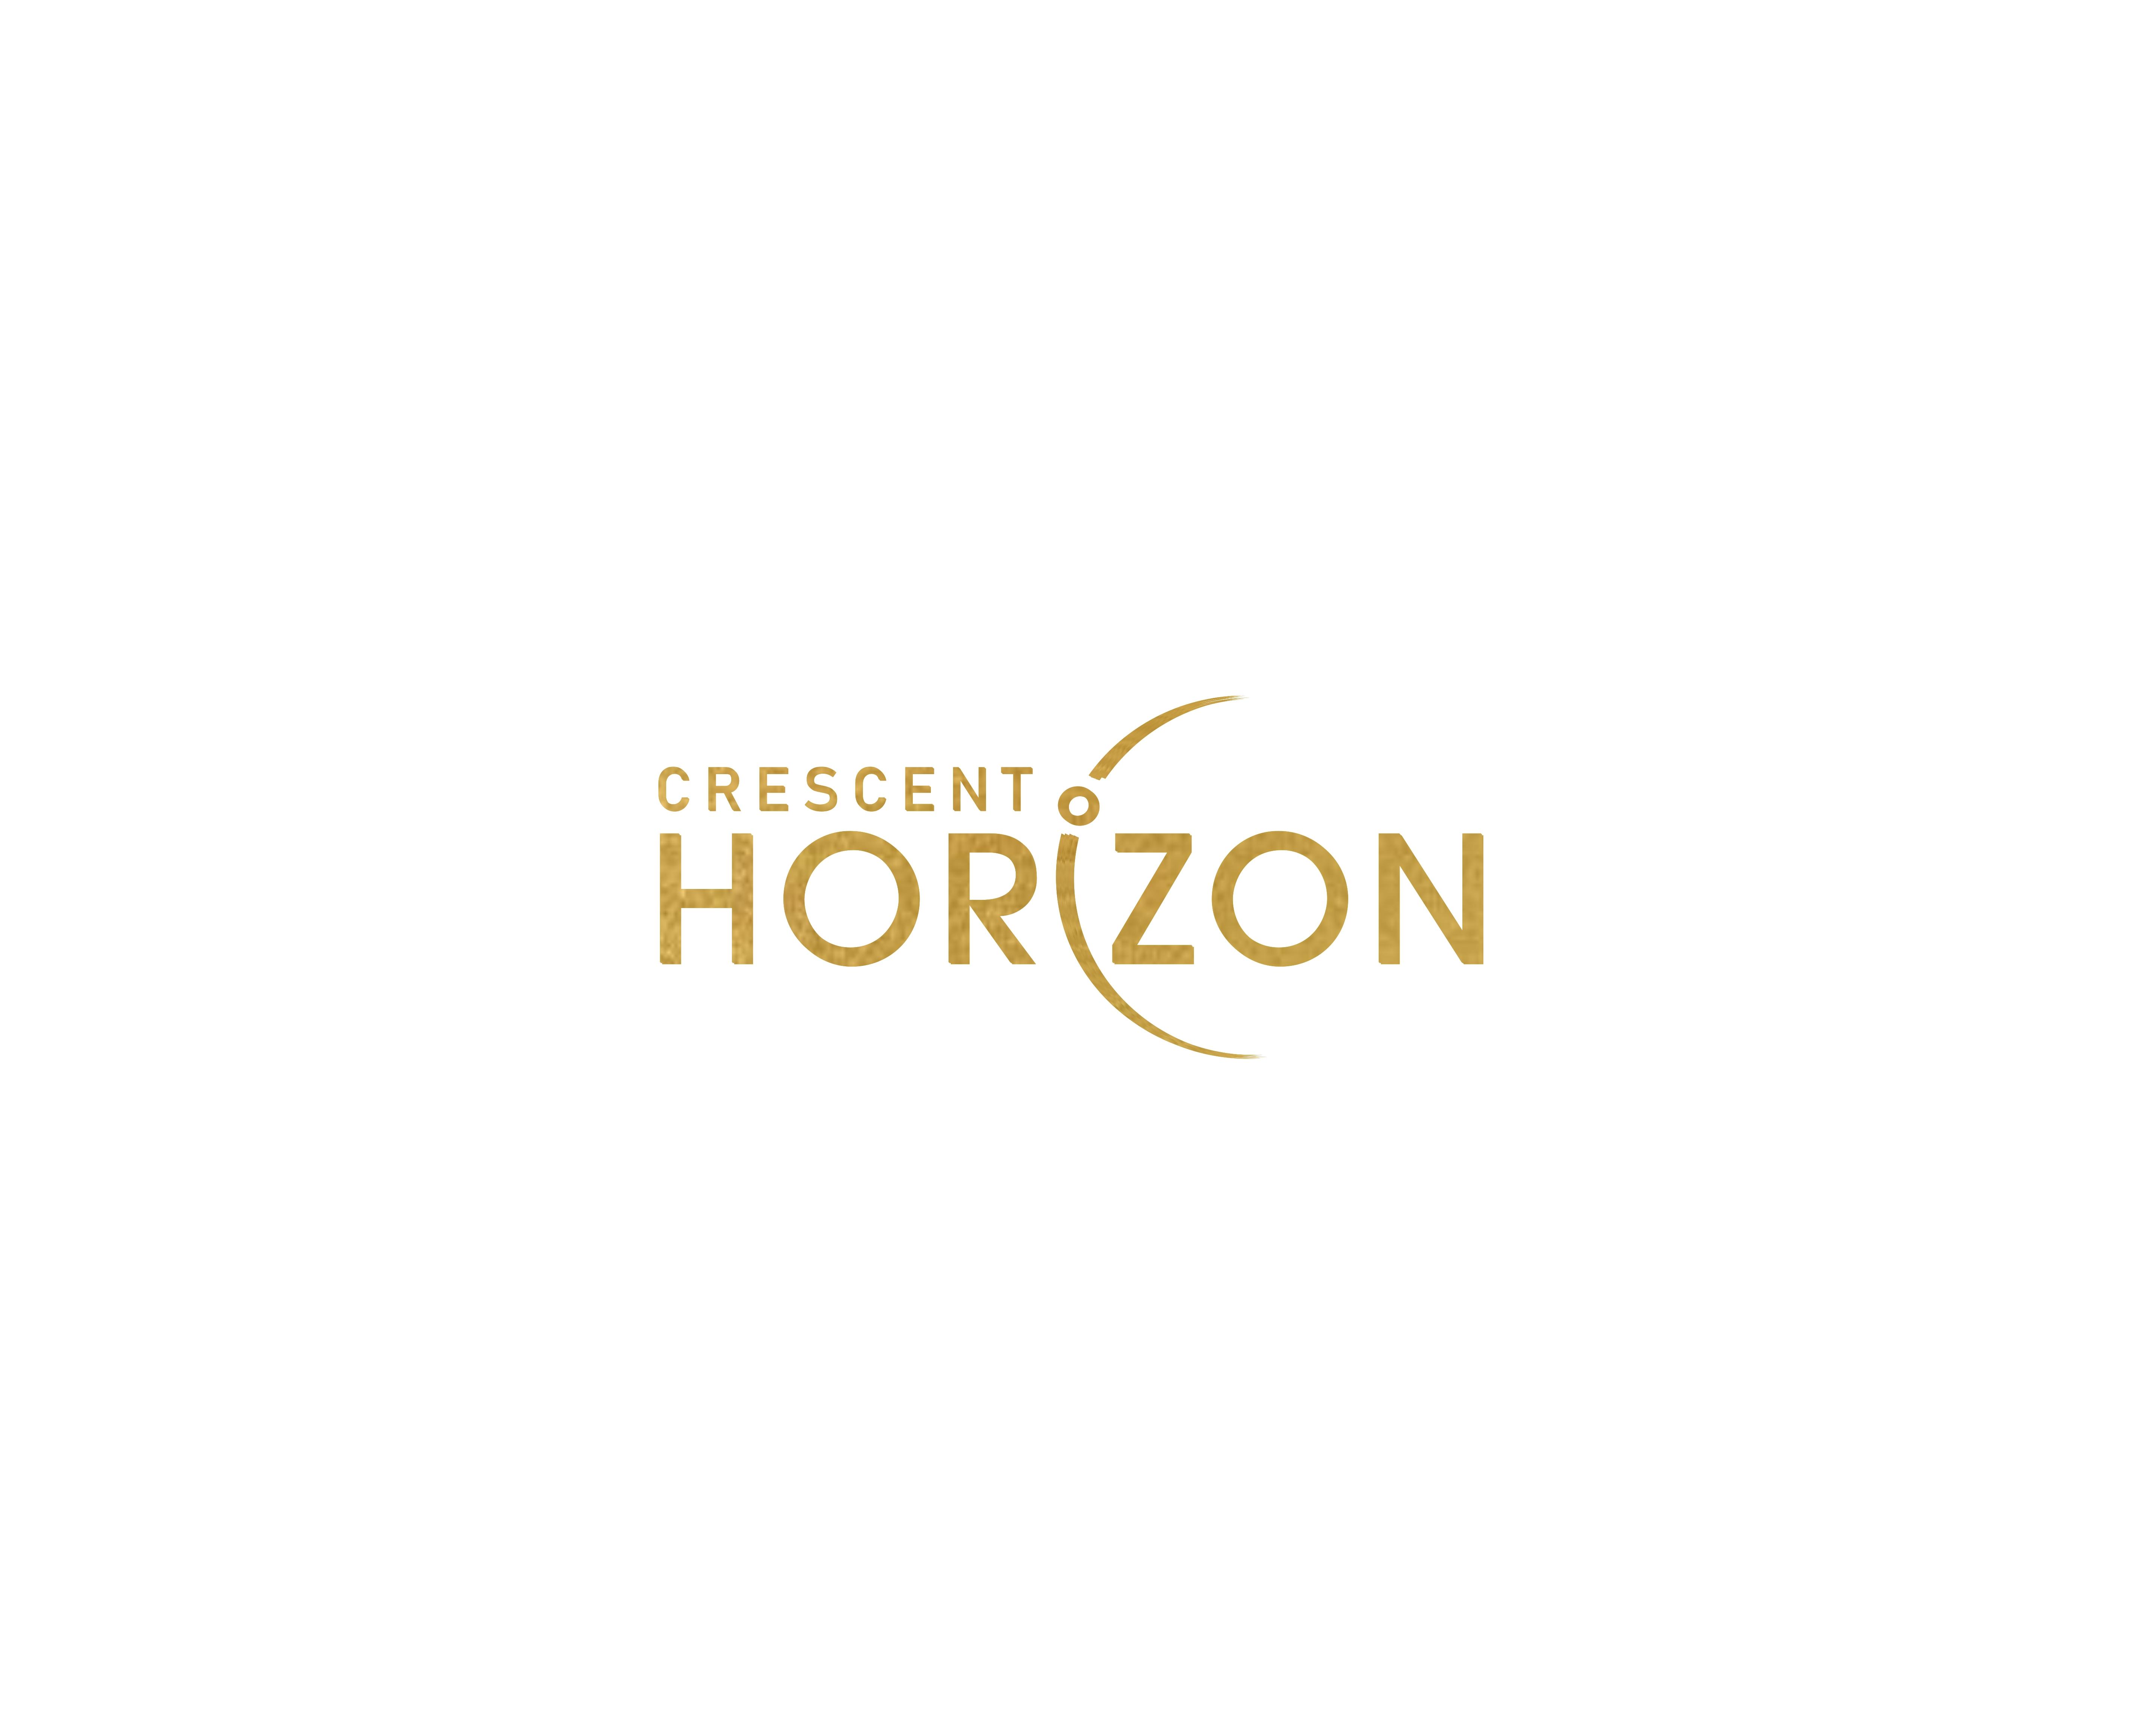 Crescent Horizon Mumbai Andheri-Dahisar